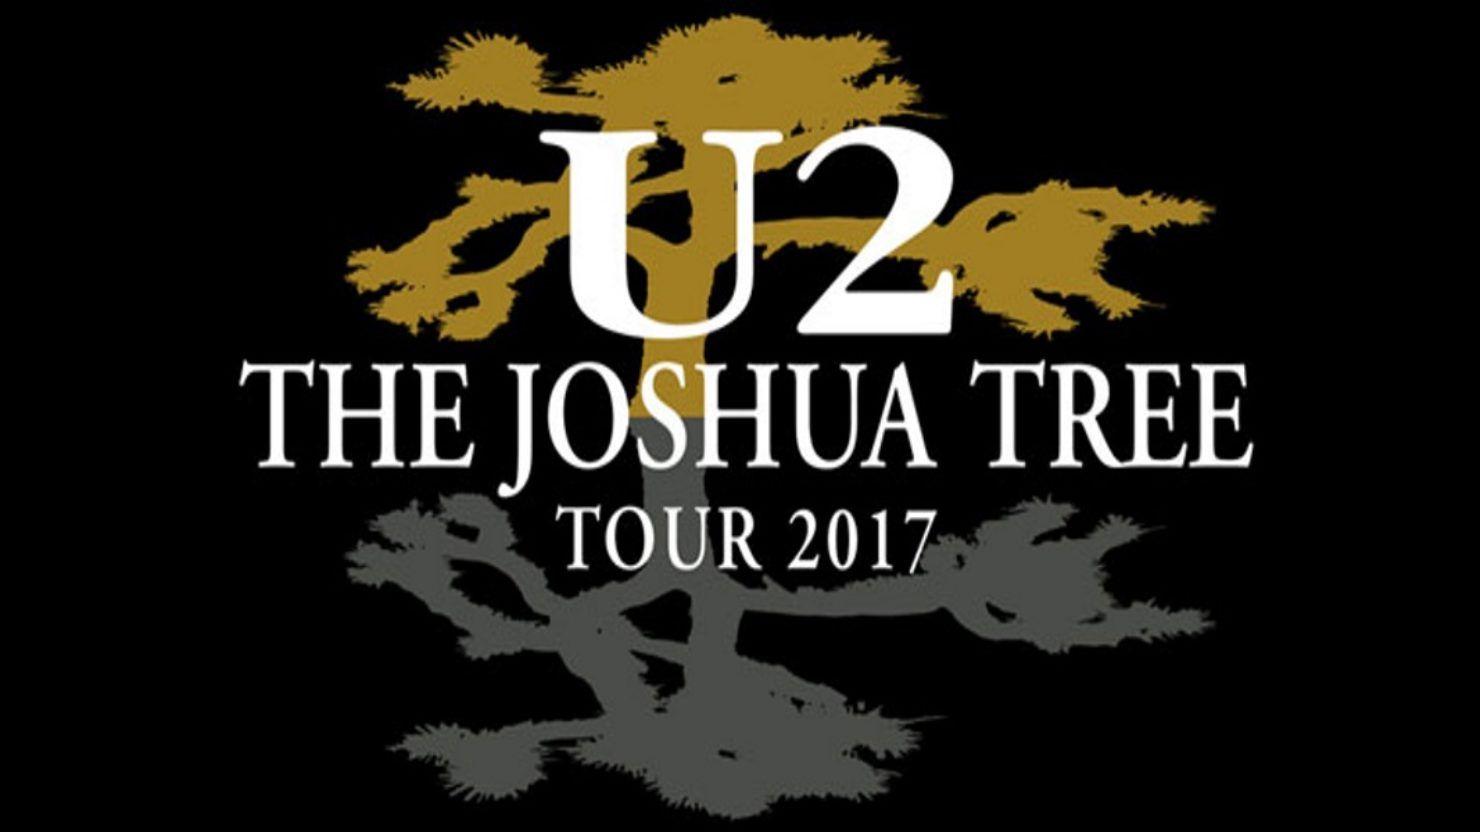 Joshua Tree Concert Tour